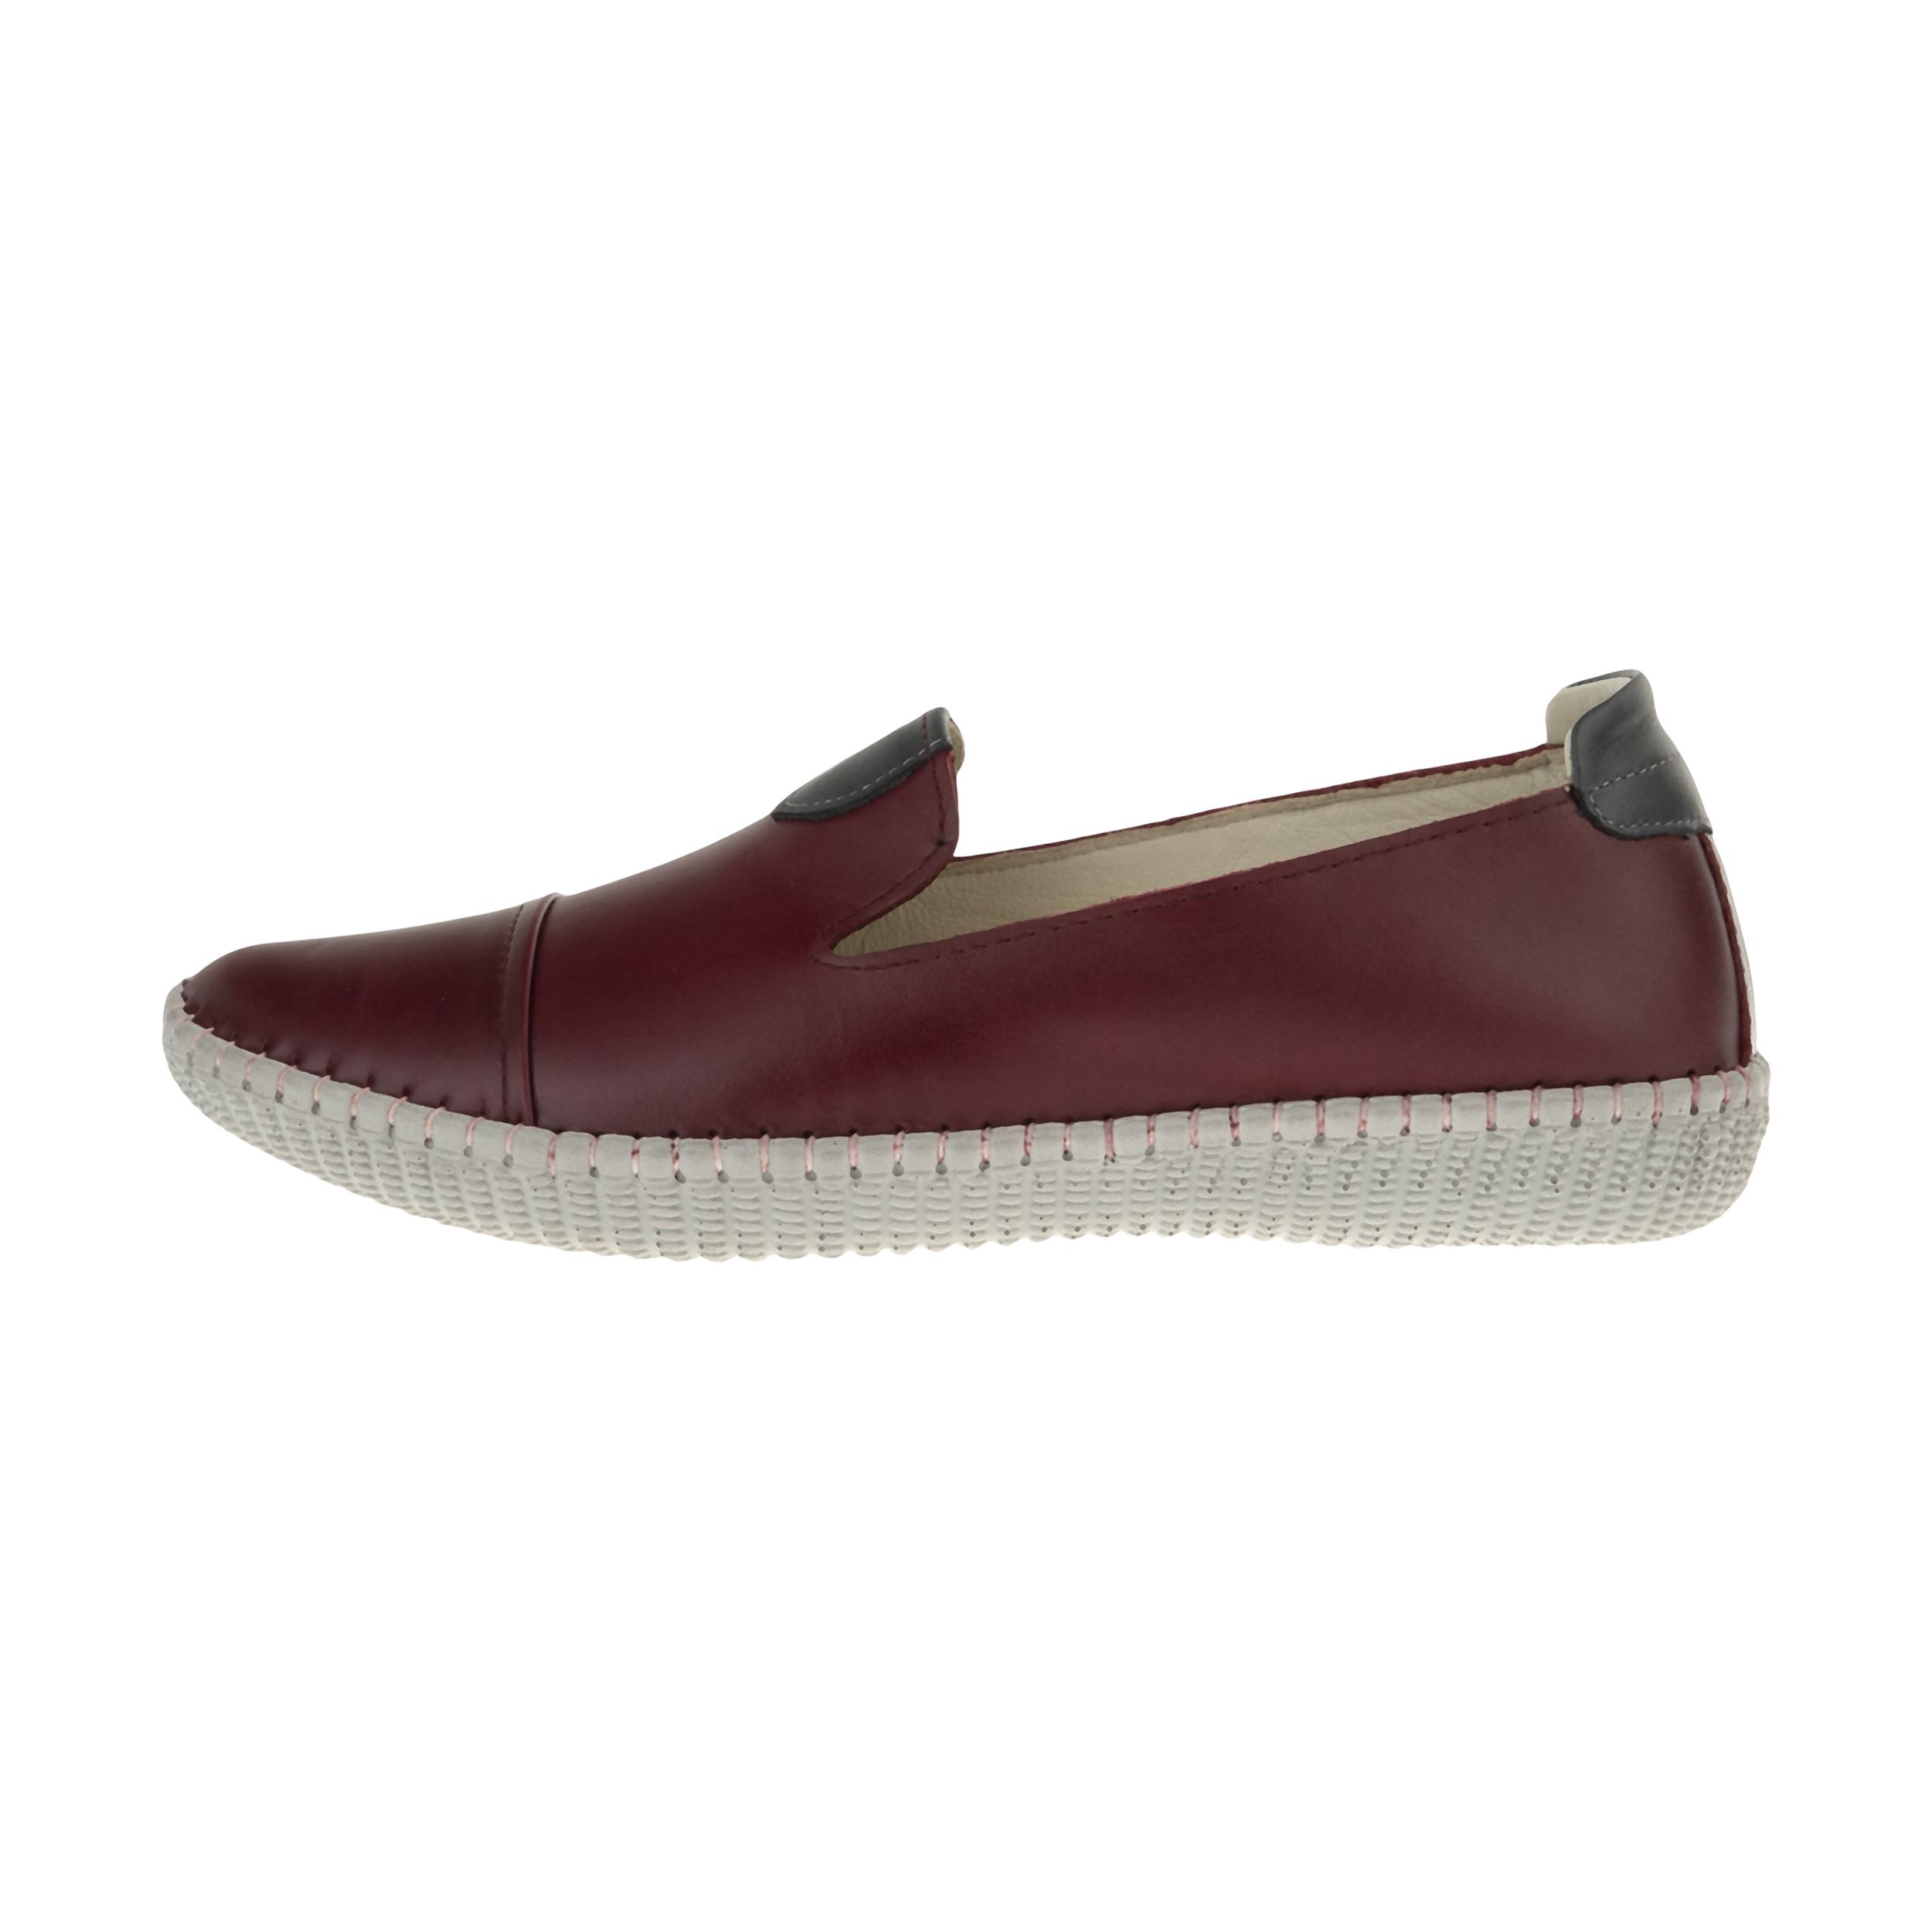 کفش روزمره زنانه گلسار مدل 5f03a500110